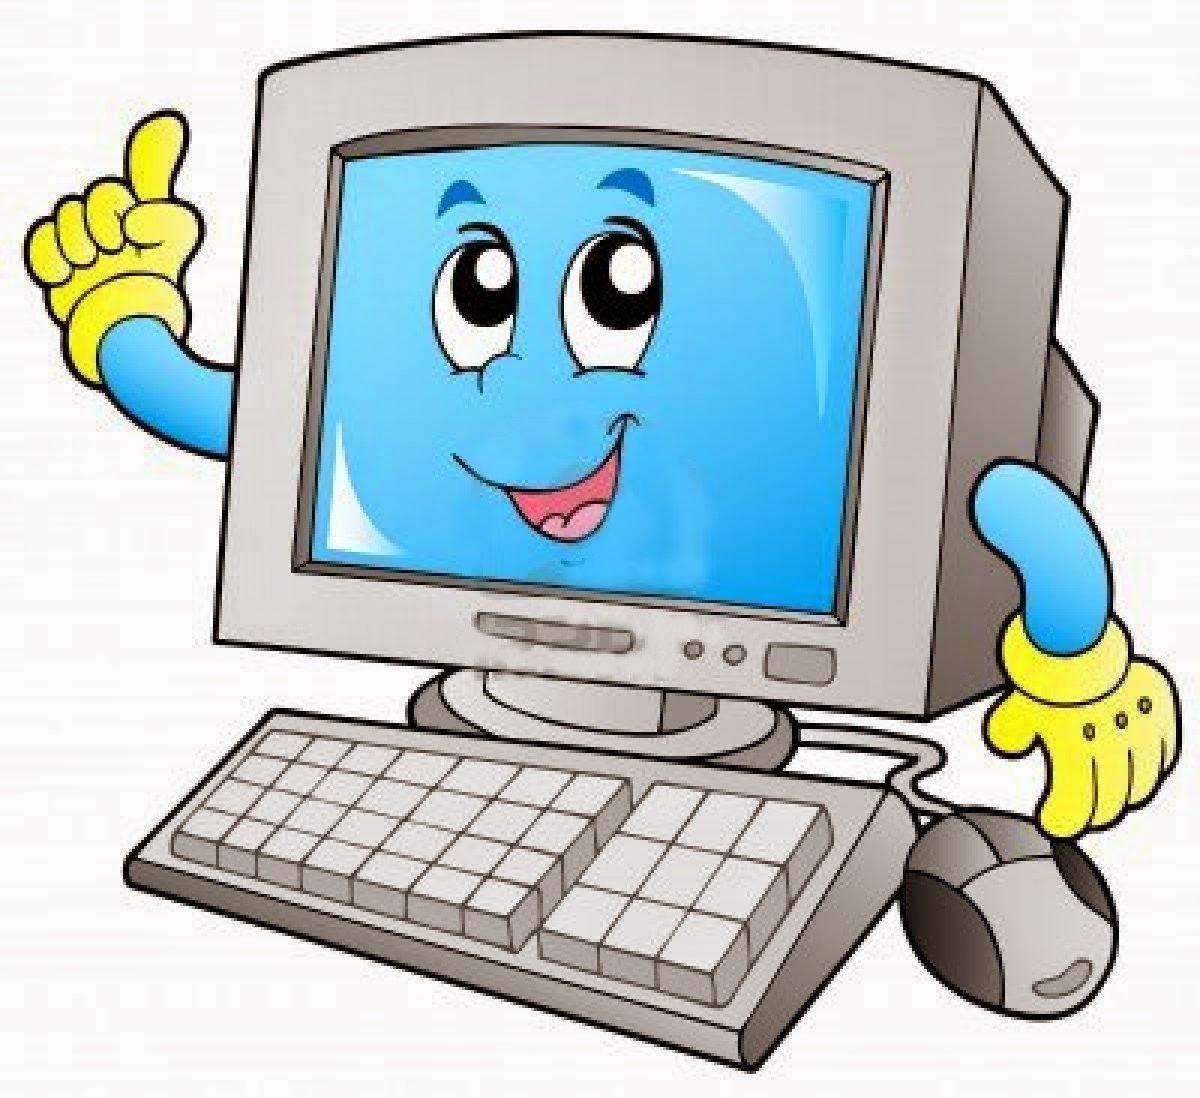 http://www.educapeques.com/aprende-informatica